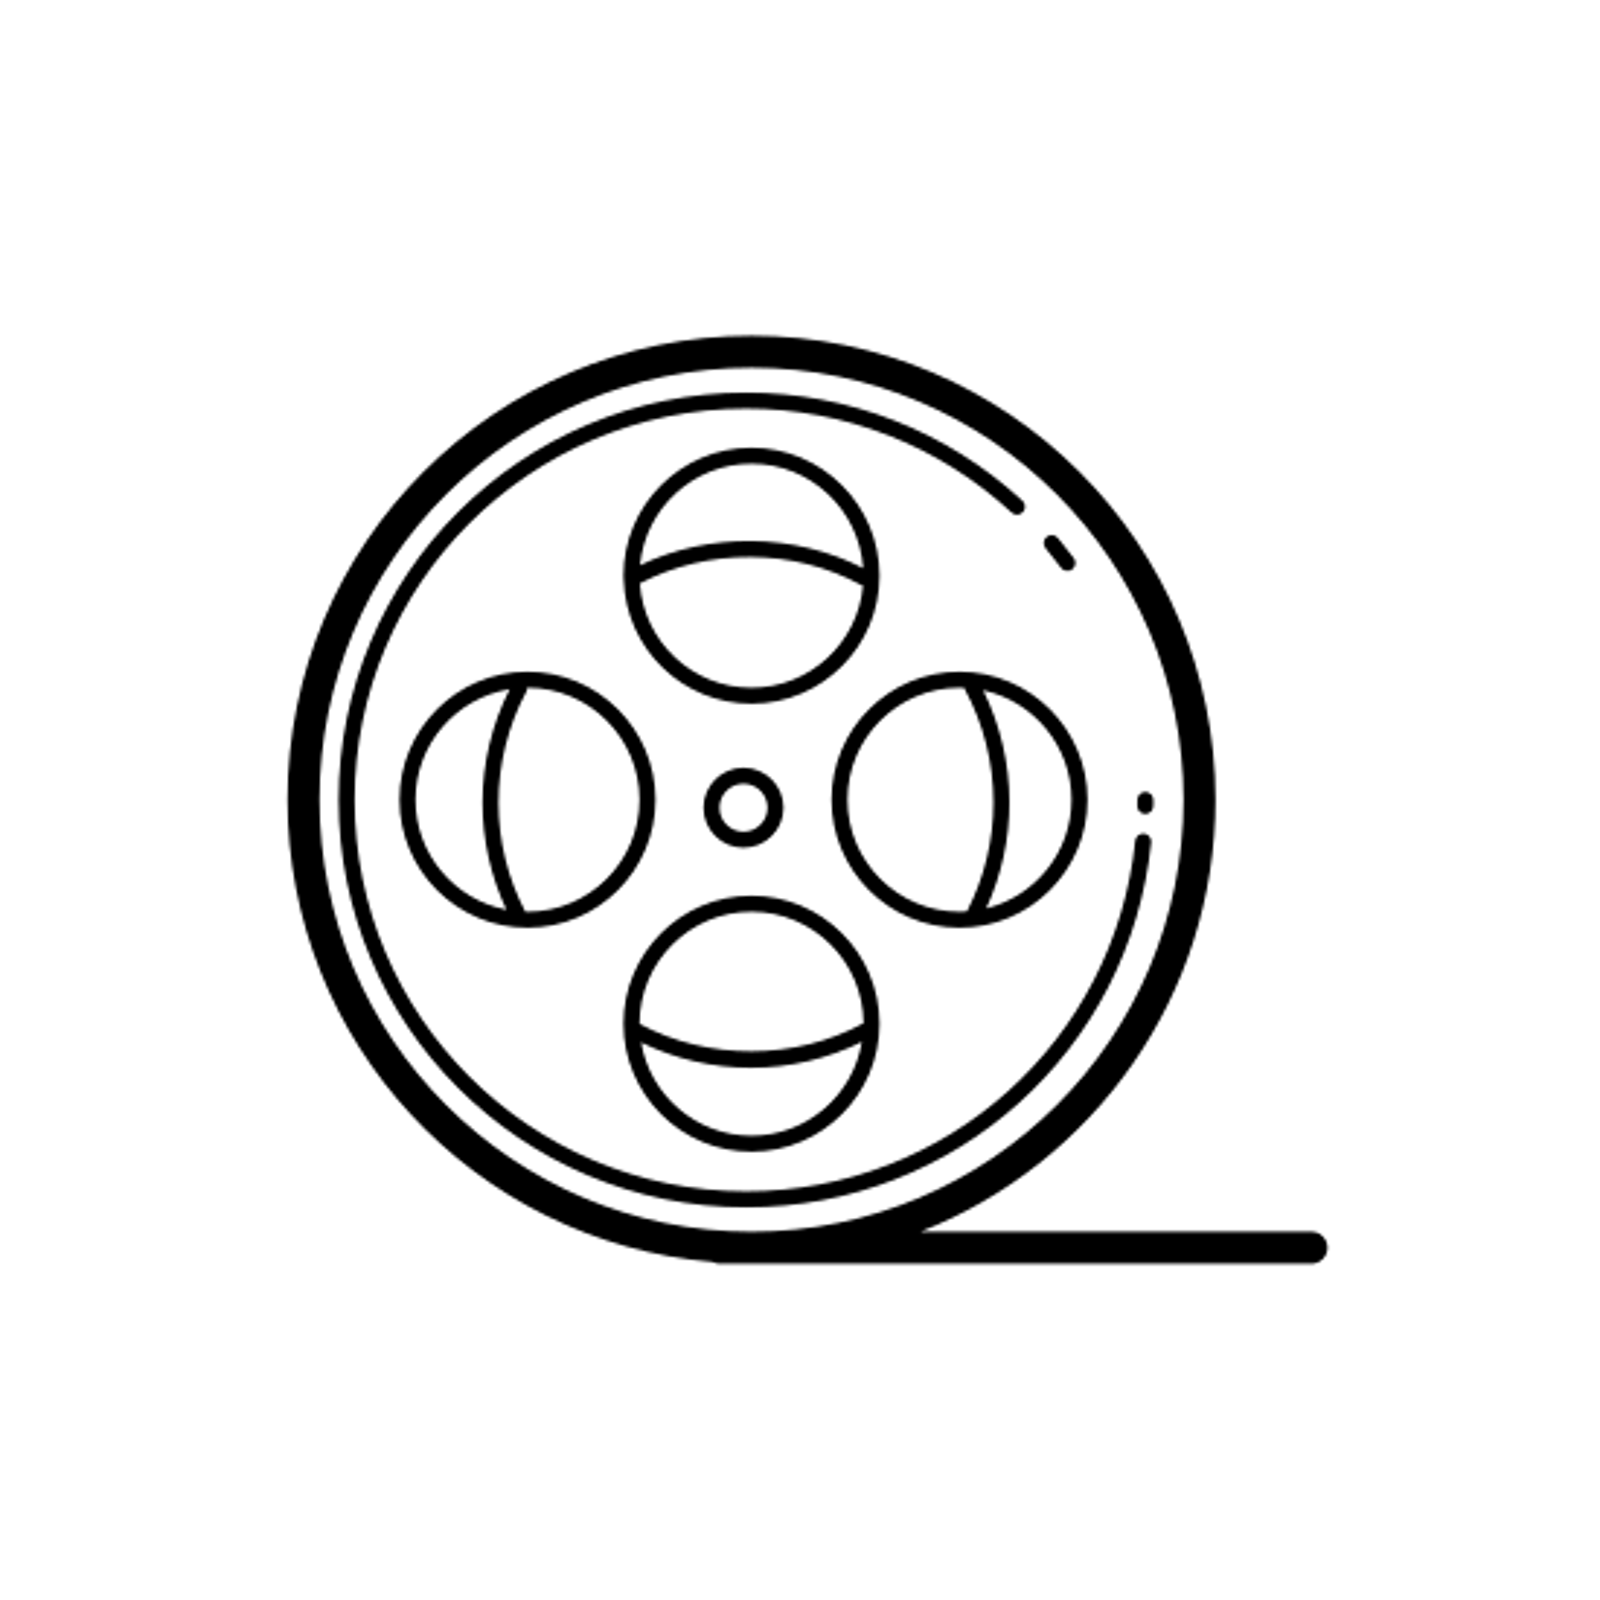 Filmrolle icon